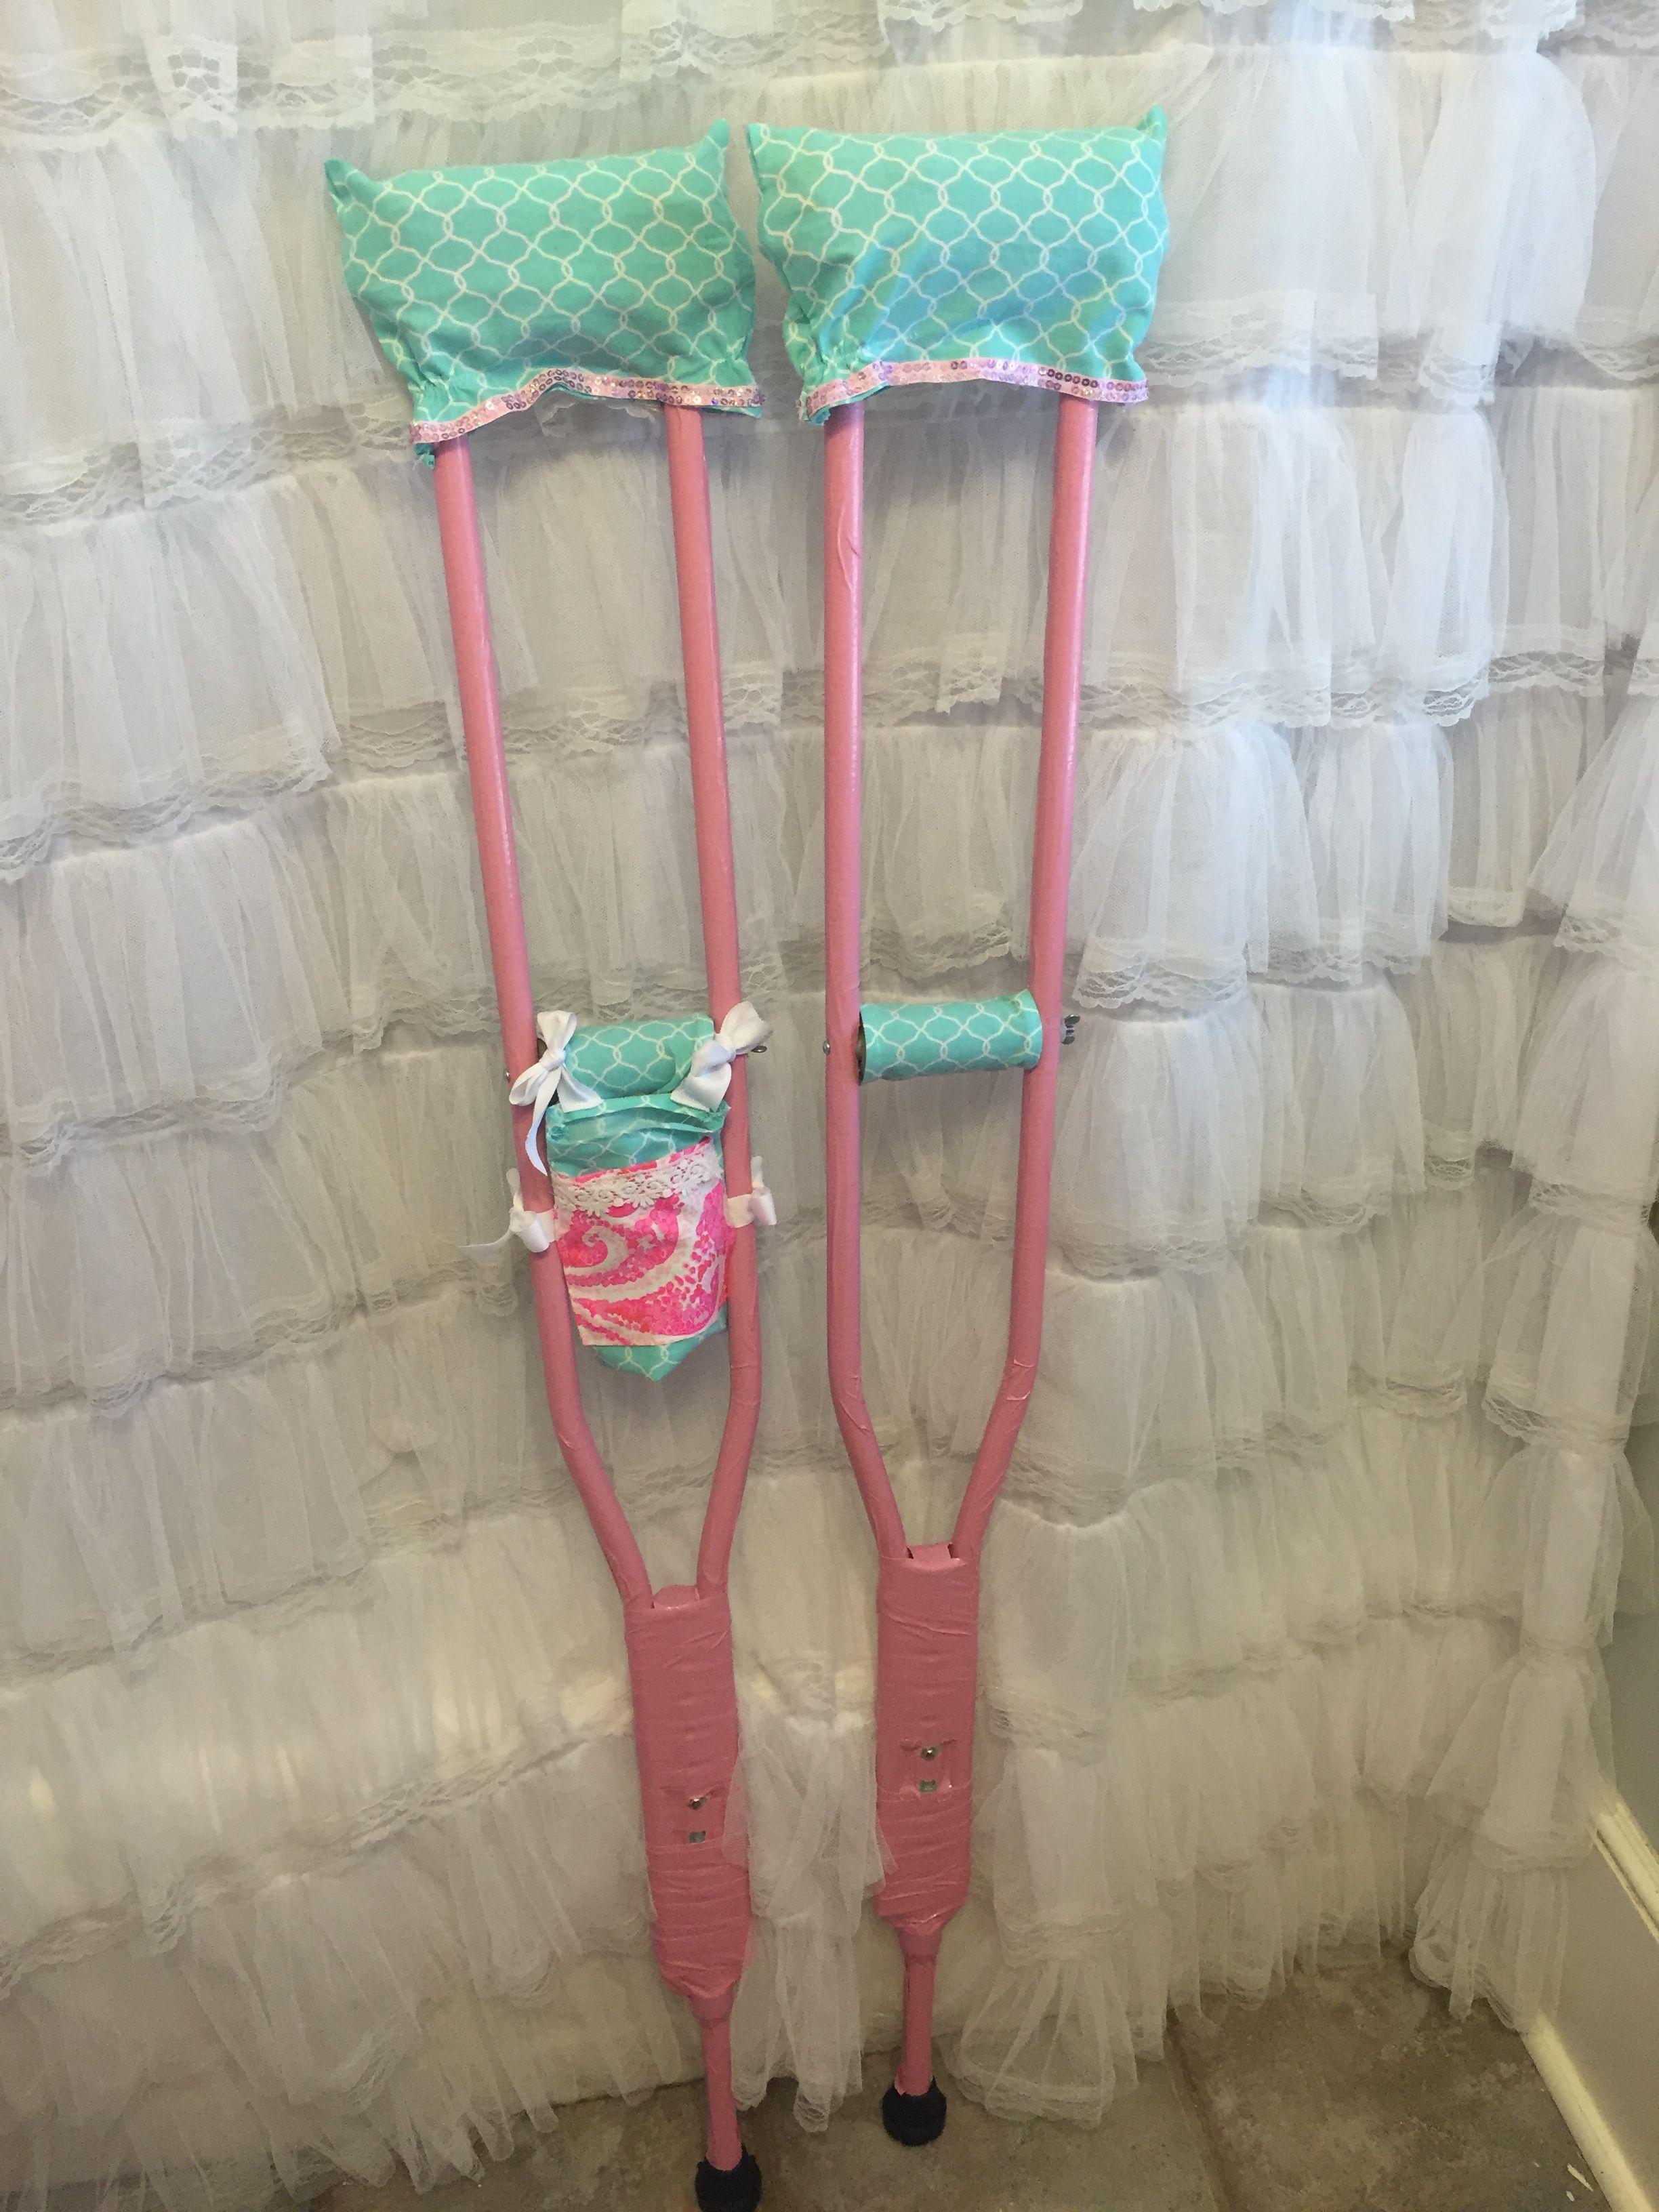 Sew Padded Crutch Covers Diy Cute Crutches Decorated Crutches Crutch Covers Crutch Pad